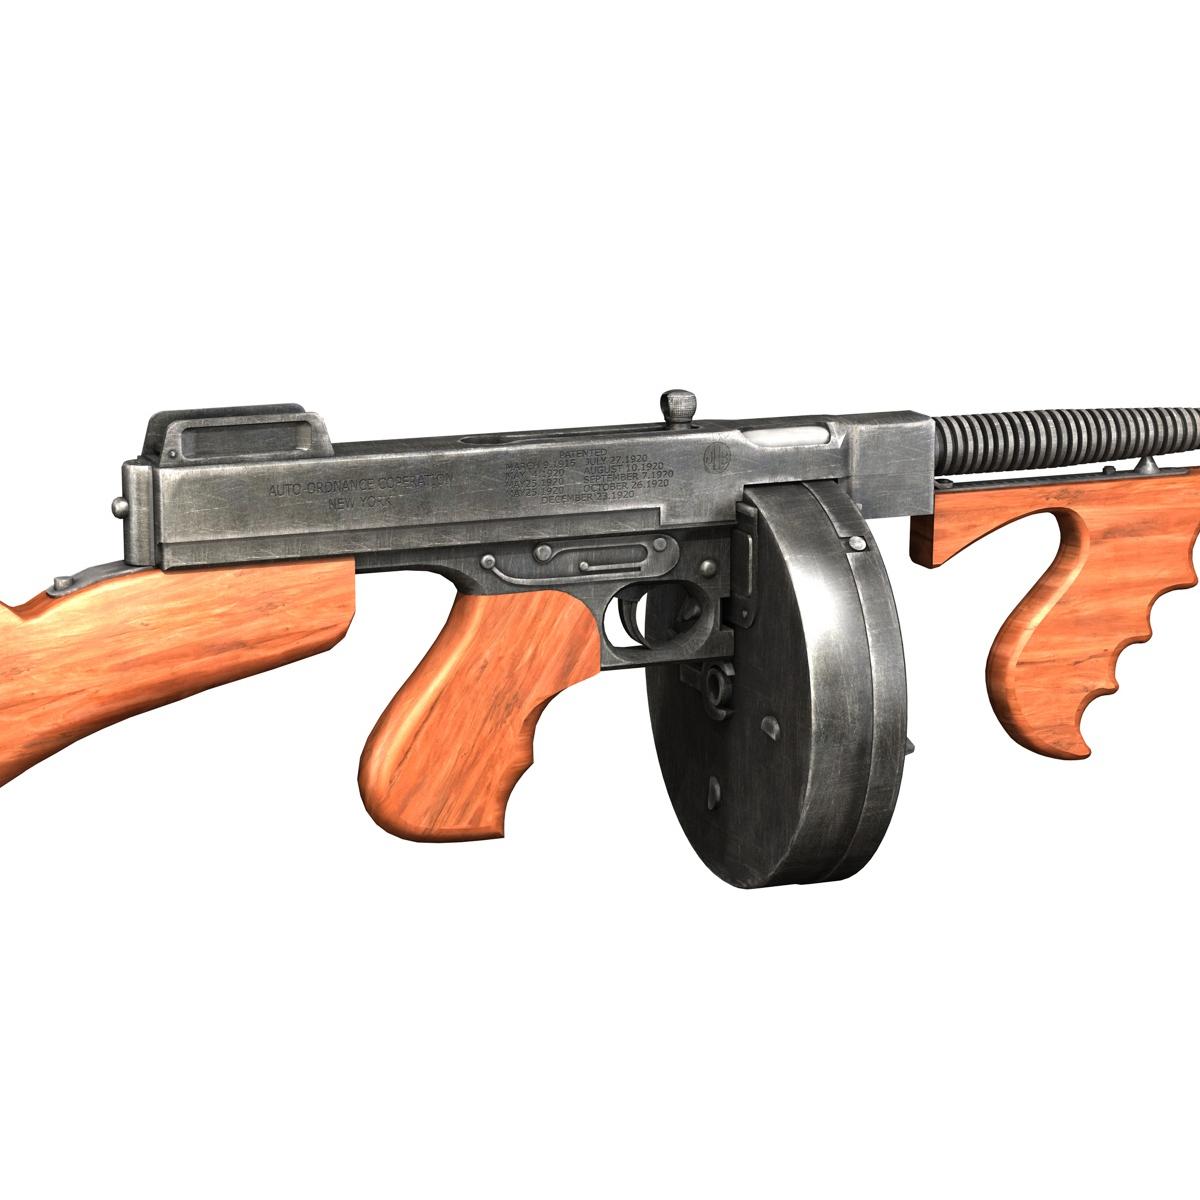 colt model1921 thompson submachine gun 3d model 3ds c4d lwo obj 264712